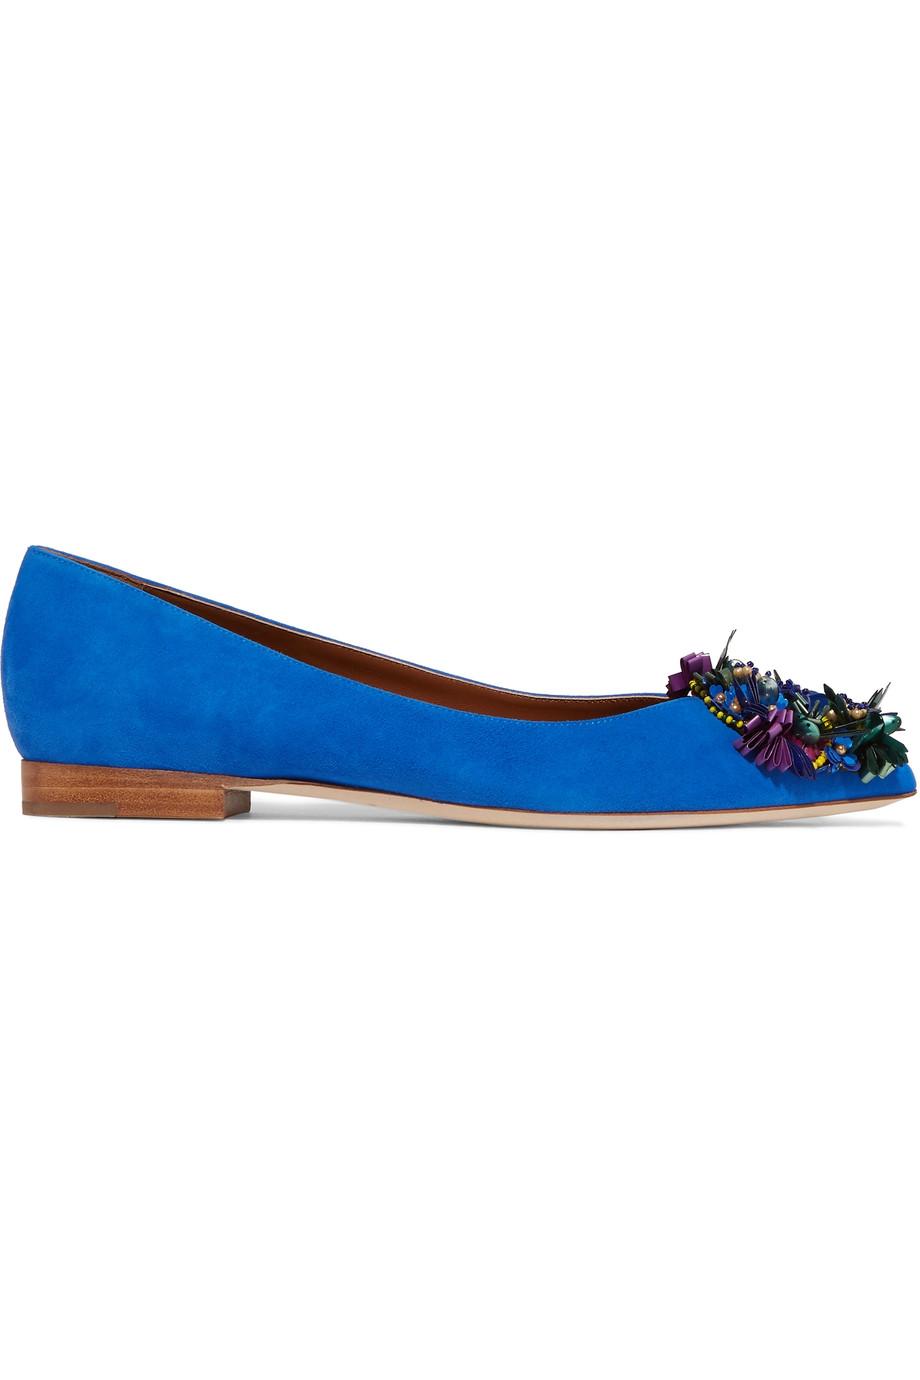 MALONE SOULIERS Billie Embellished Suede Point-Toe Ballet Flats